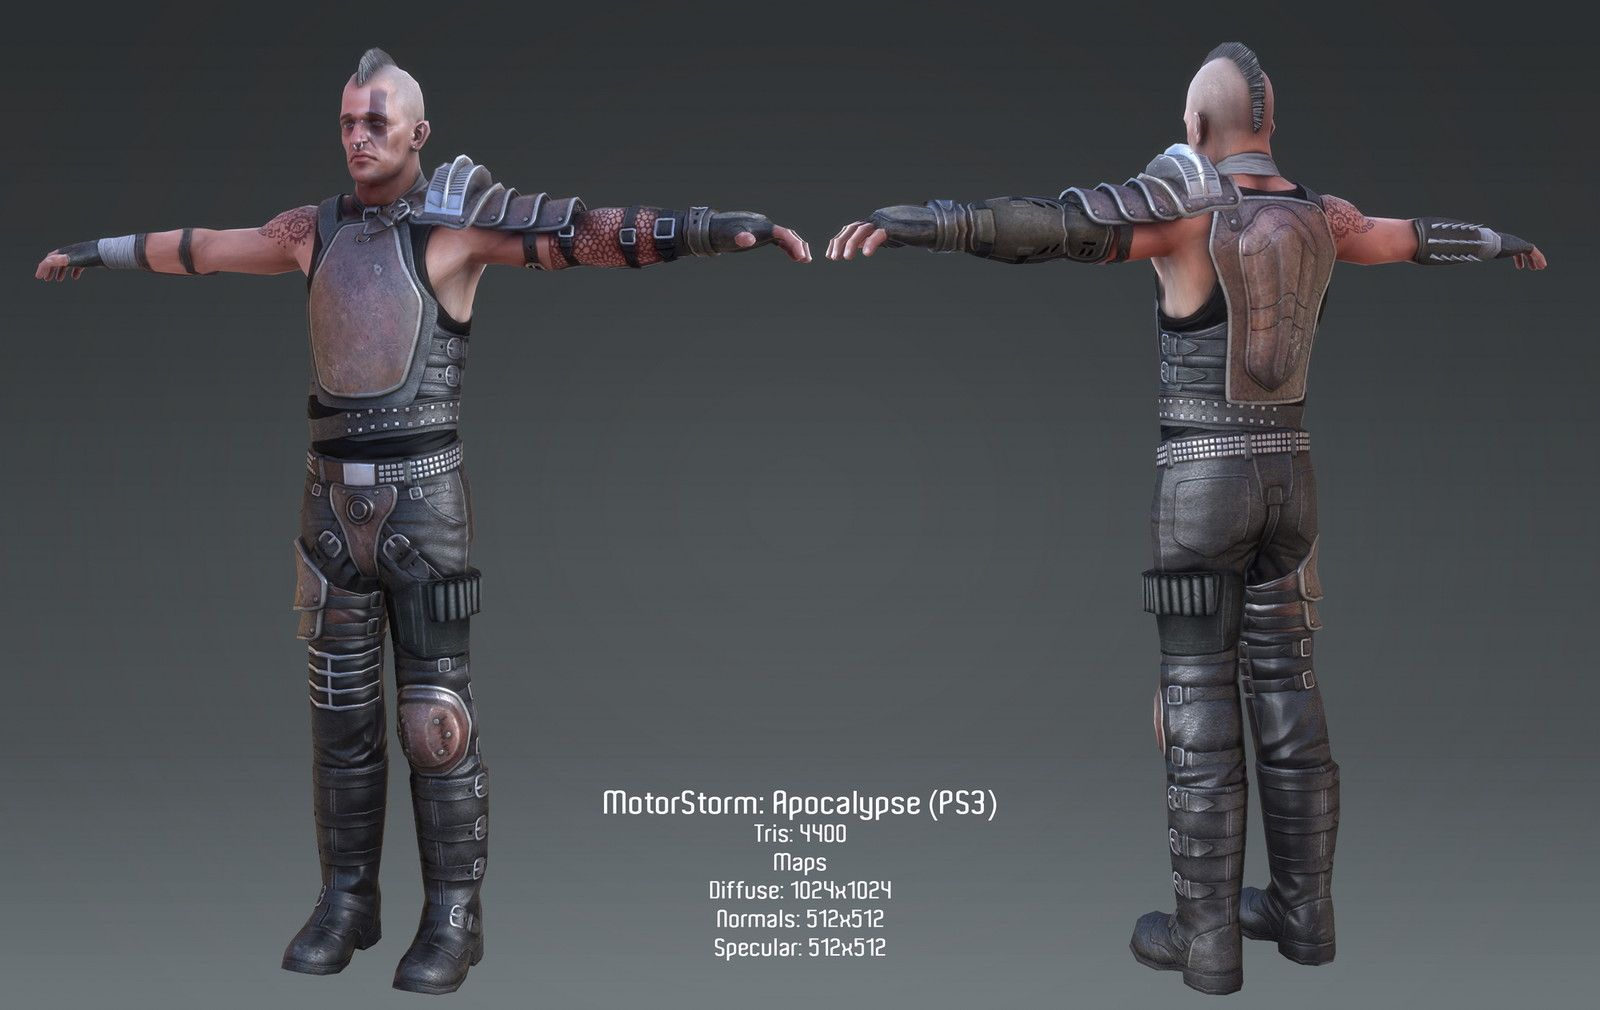 Motorstorm: Apocalypsee  - Male Character 01, Saleh Ahmed on ArtStation at https://www.artstation.com/artwork/LkL6A